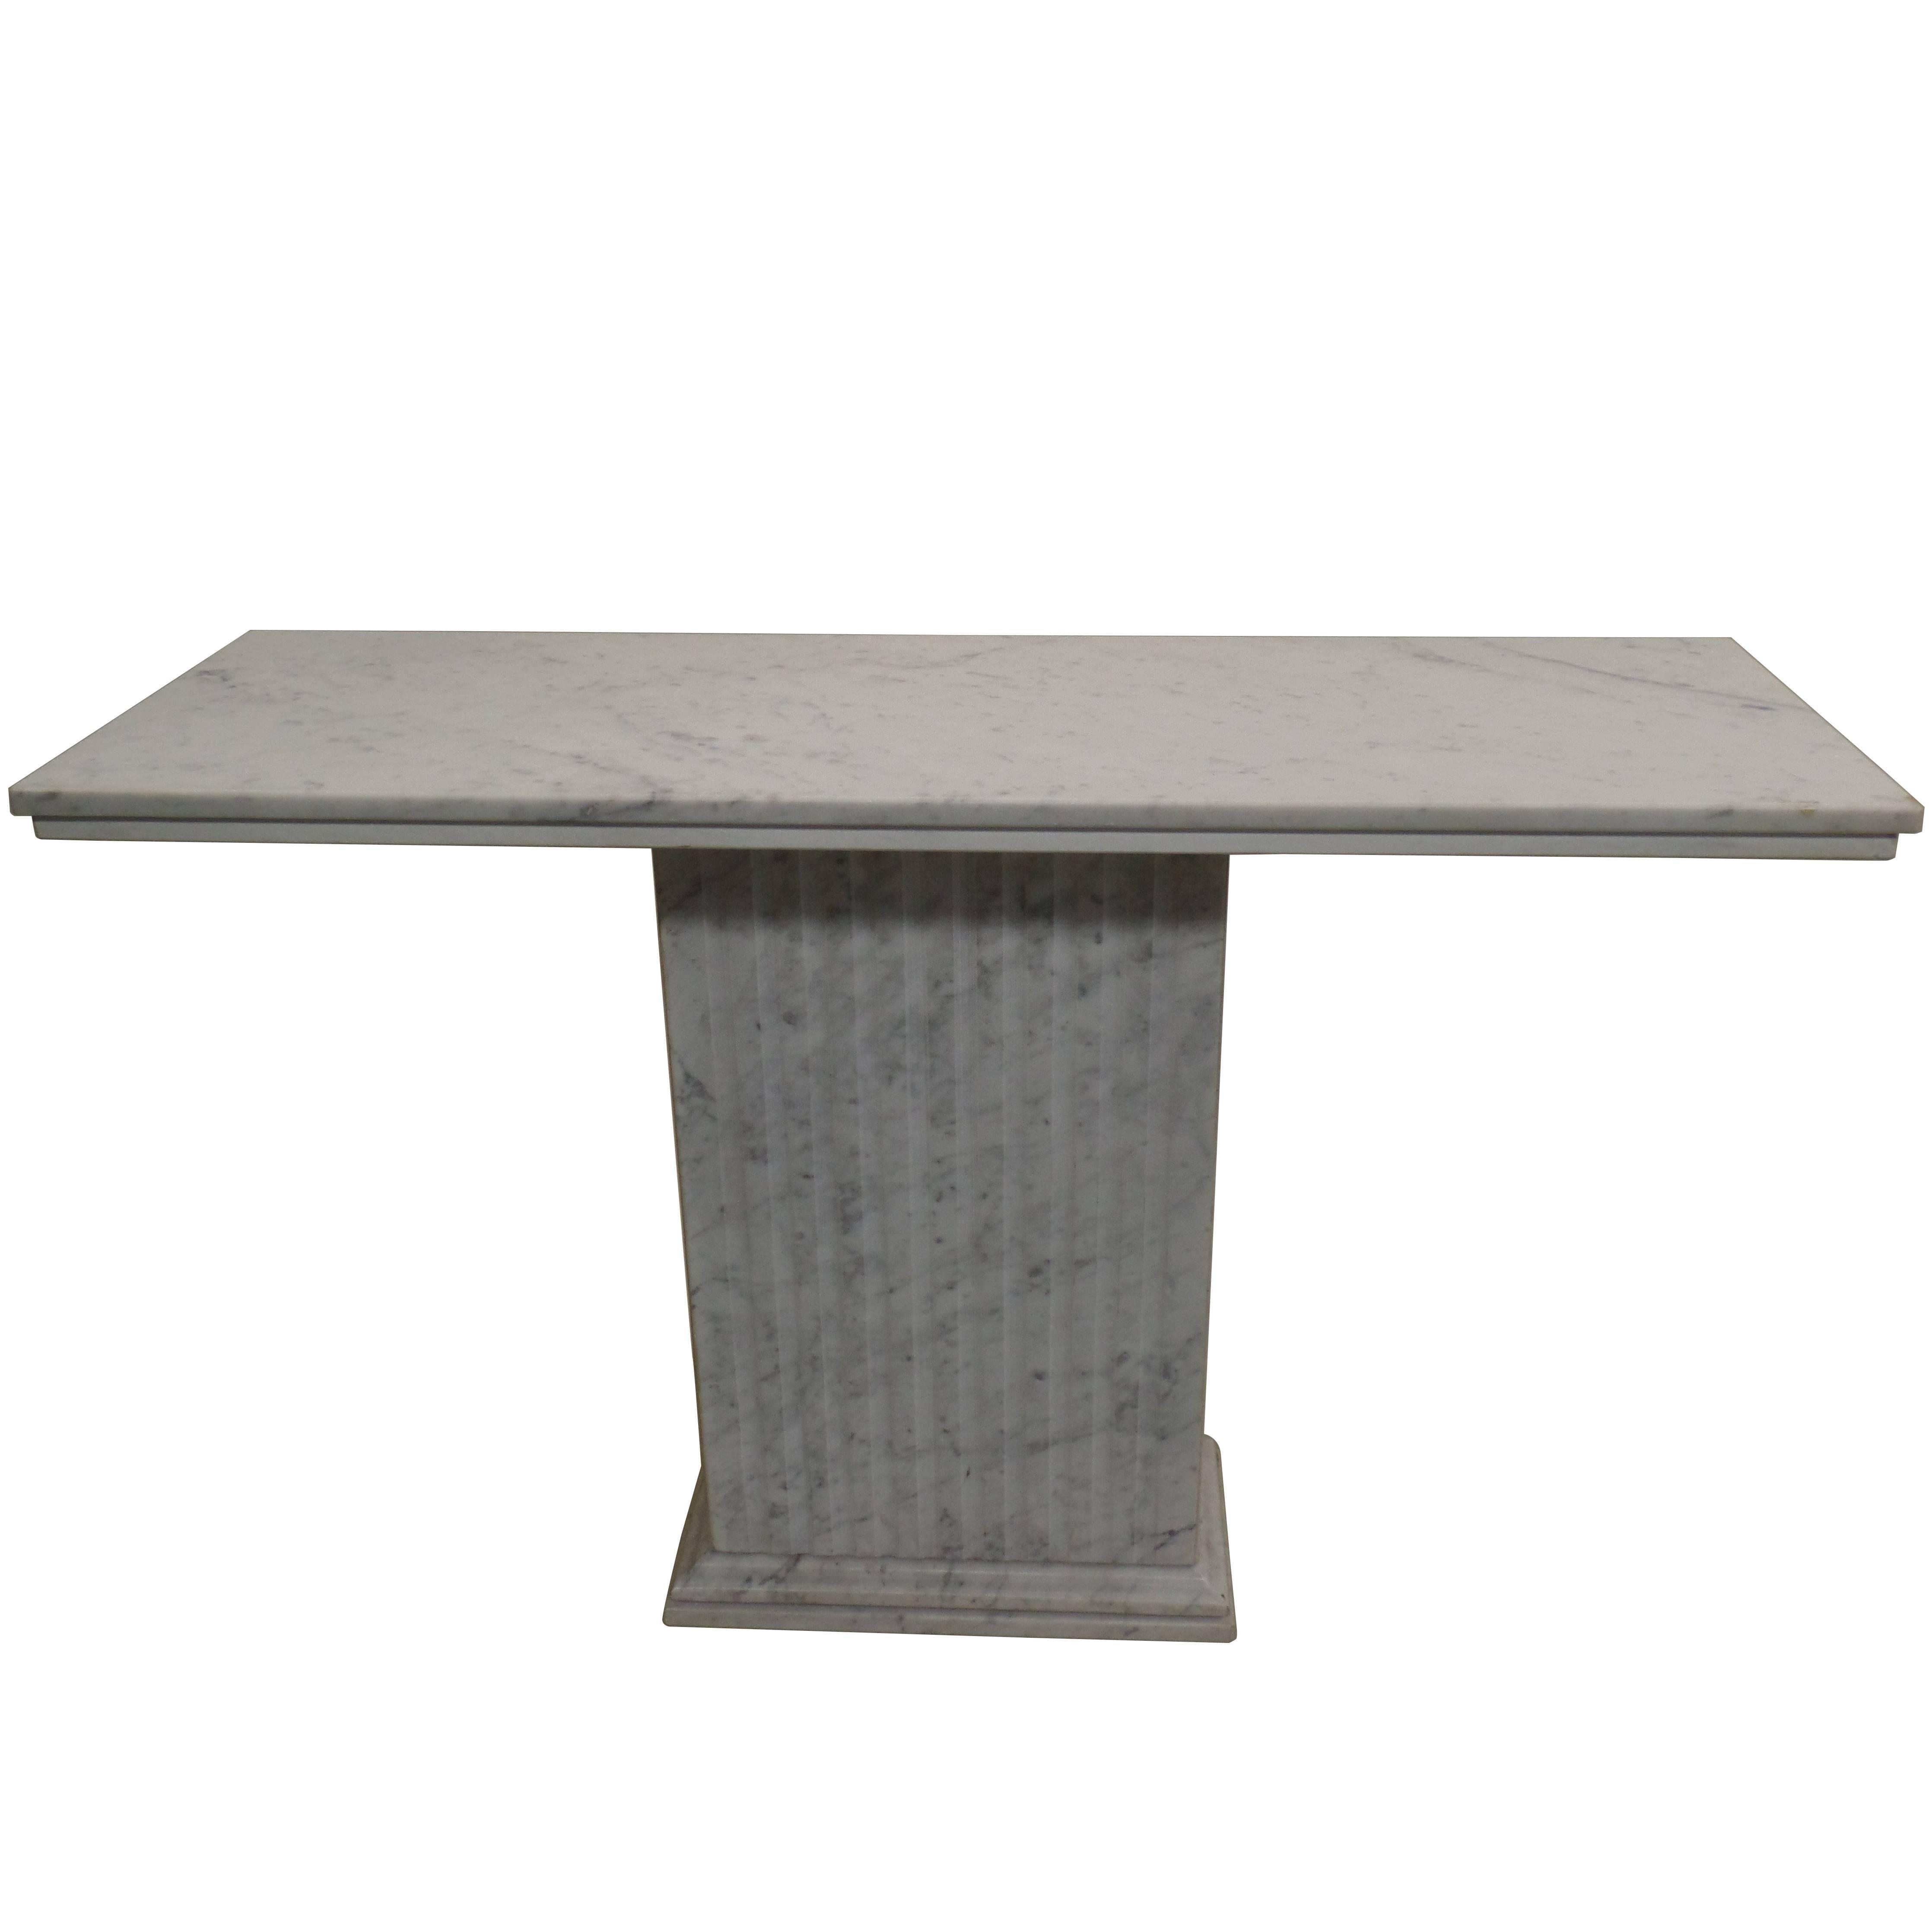 2 Italian Mid-Century Modern Carrara Marble Consoles /Sofa Tables Marcel Breuer